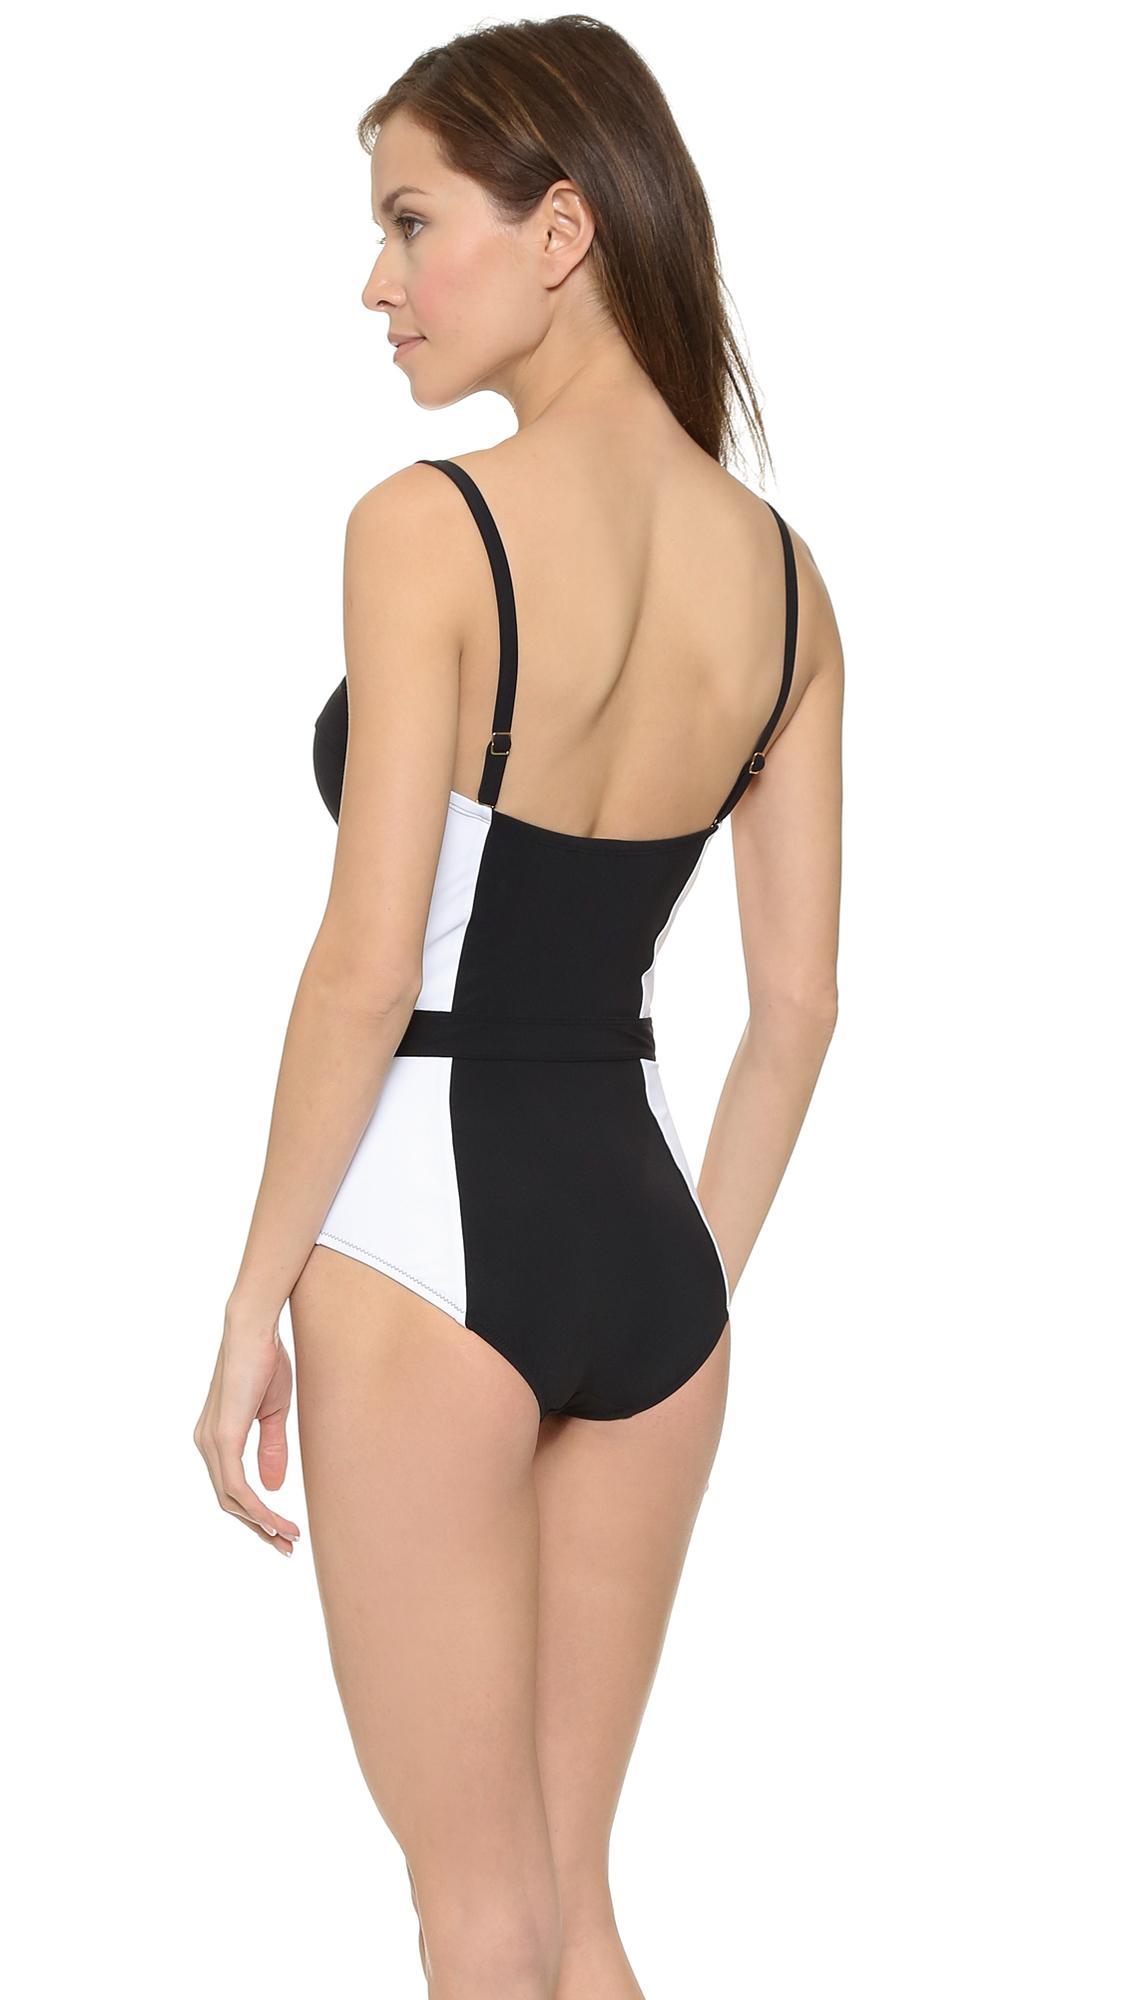 48051d2608b57 Lyst - Tory Burch Lipsi One Piece Swimsuit in Black